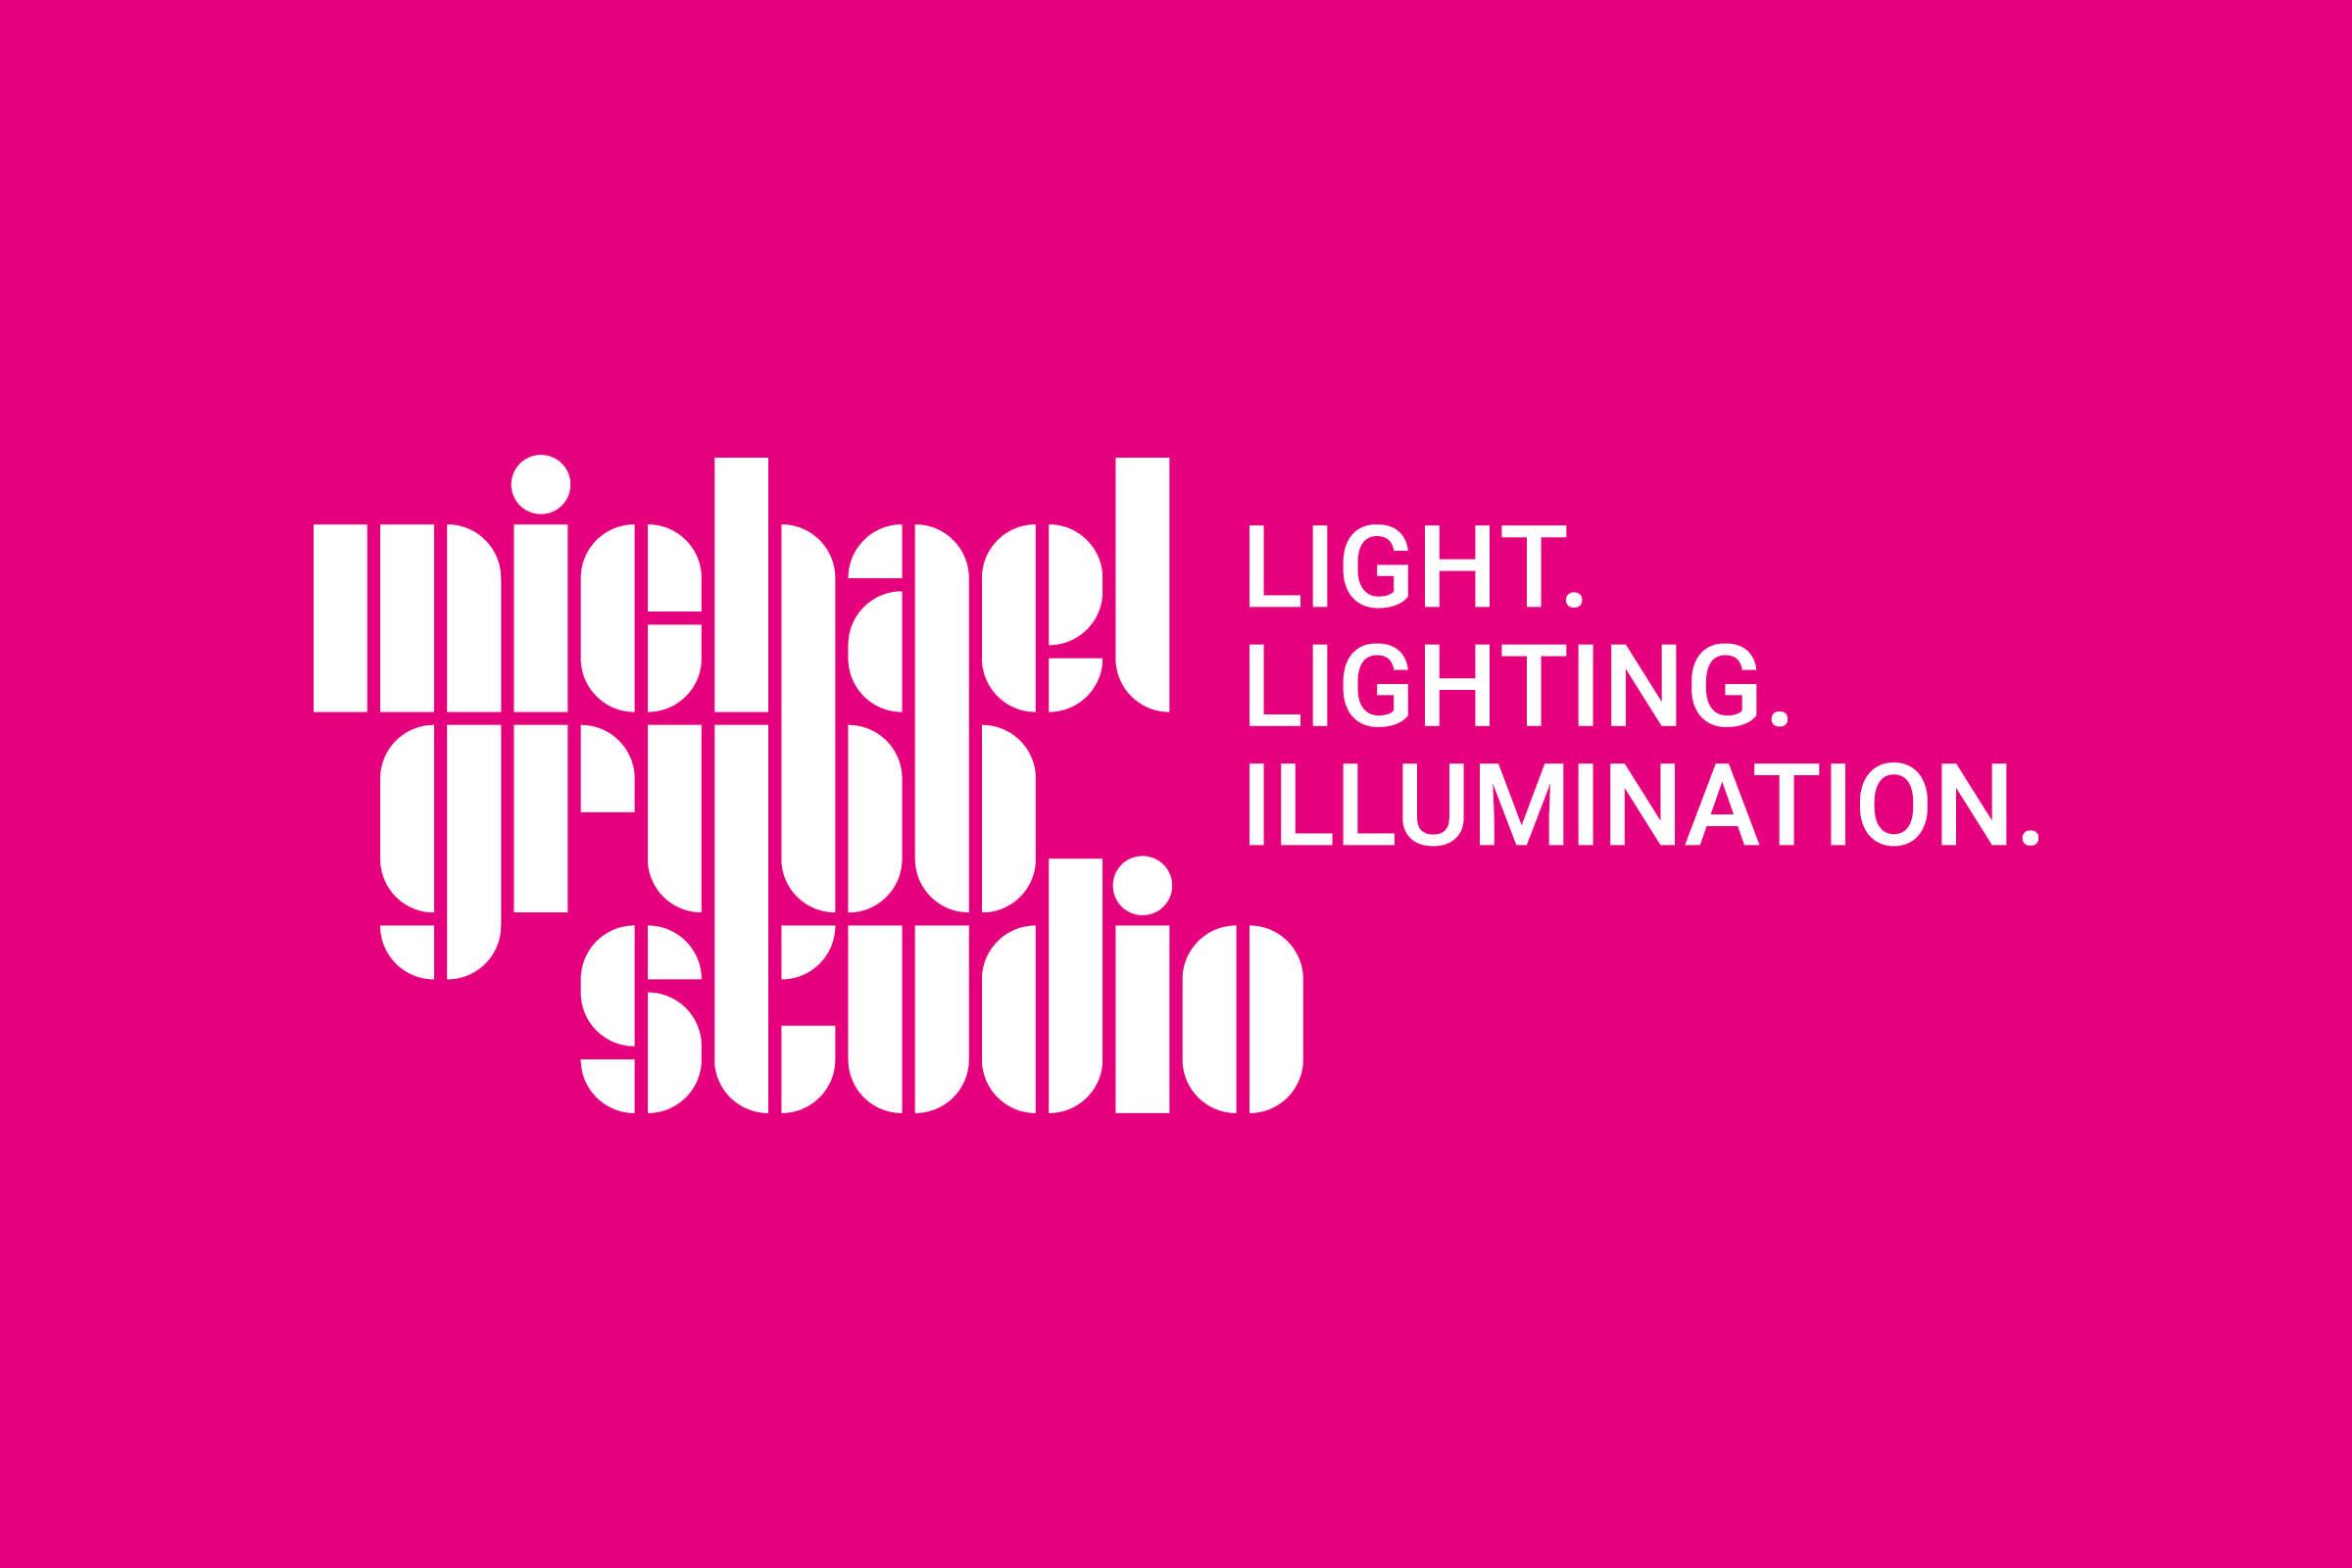 saul studio — Michael Grubb Studio